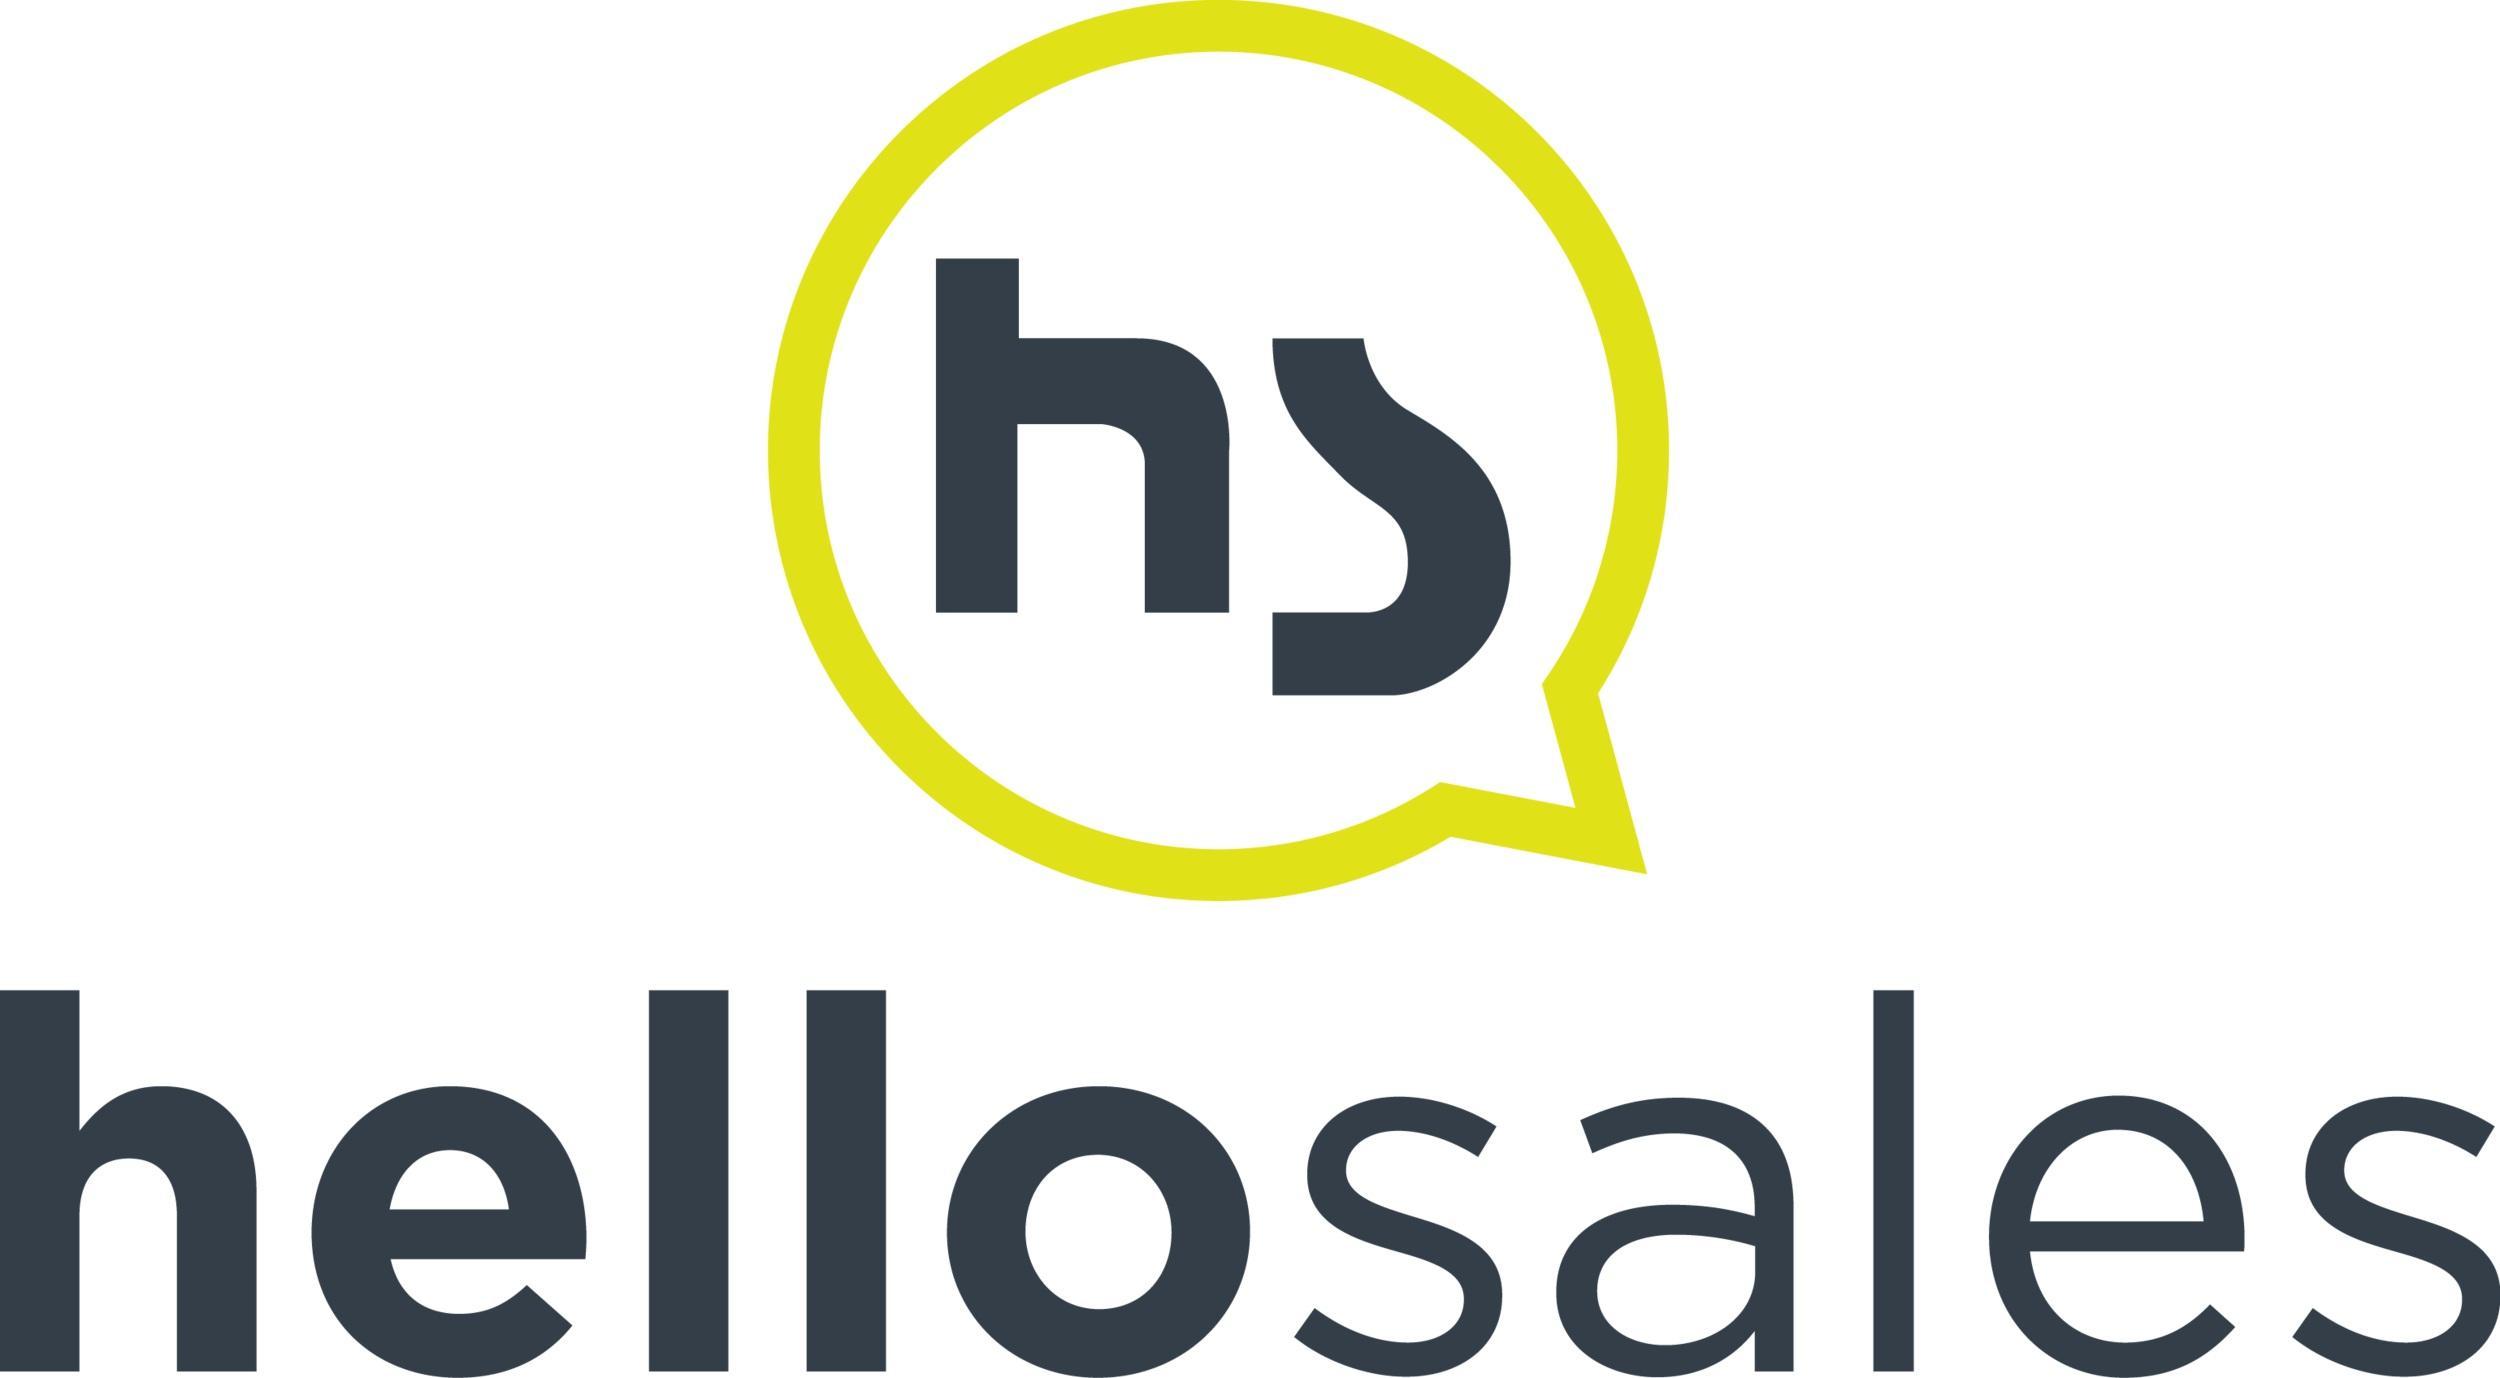 HS_grey_text_yellow_bubble.jpg